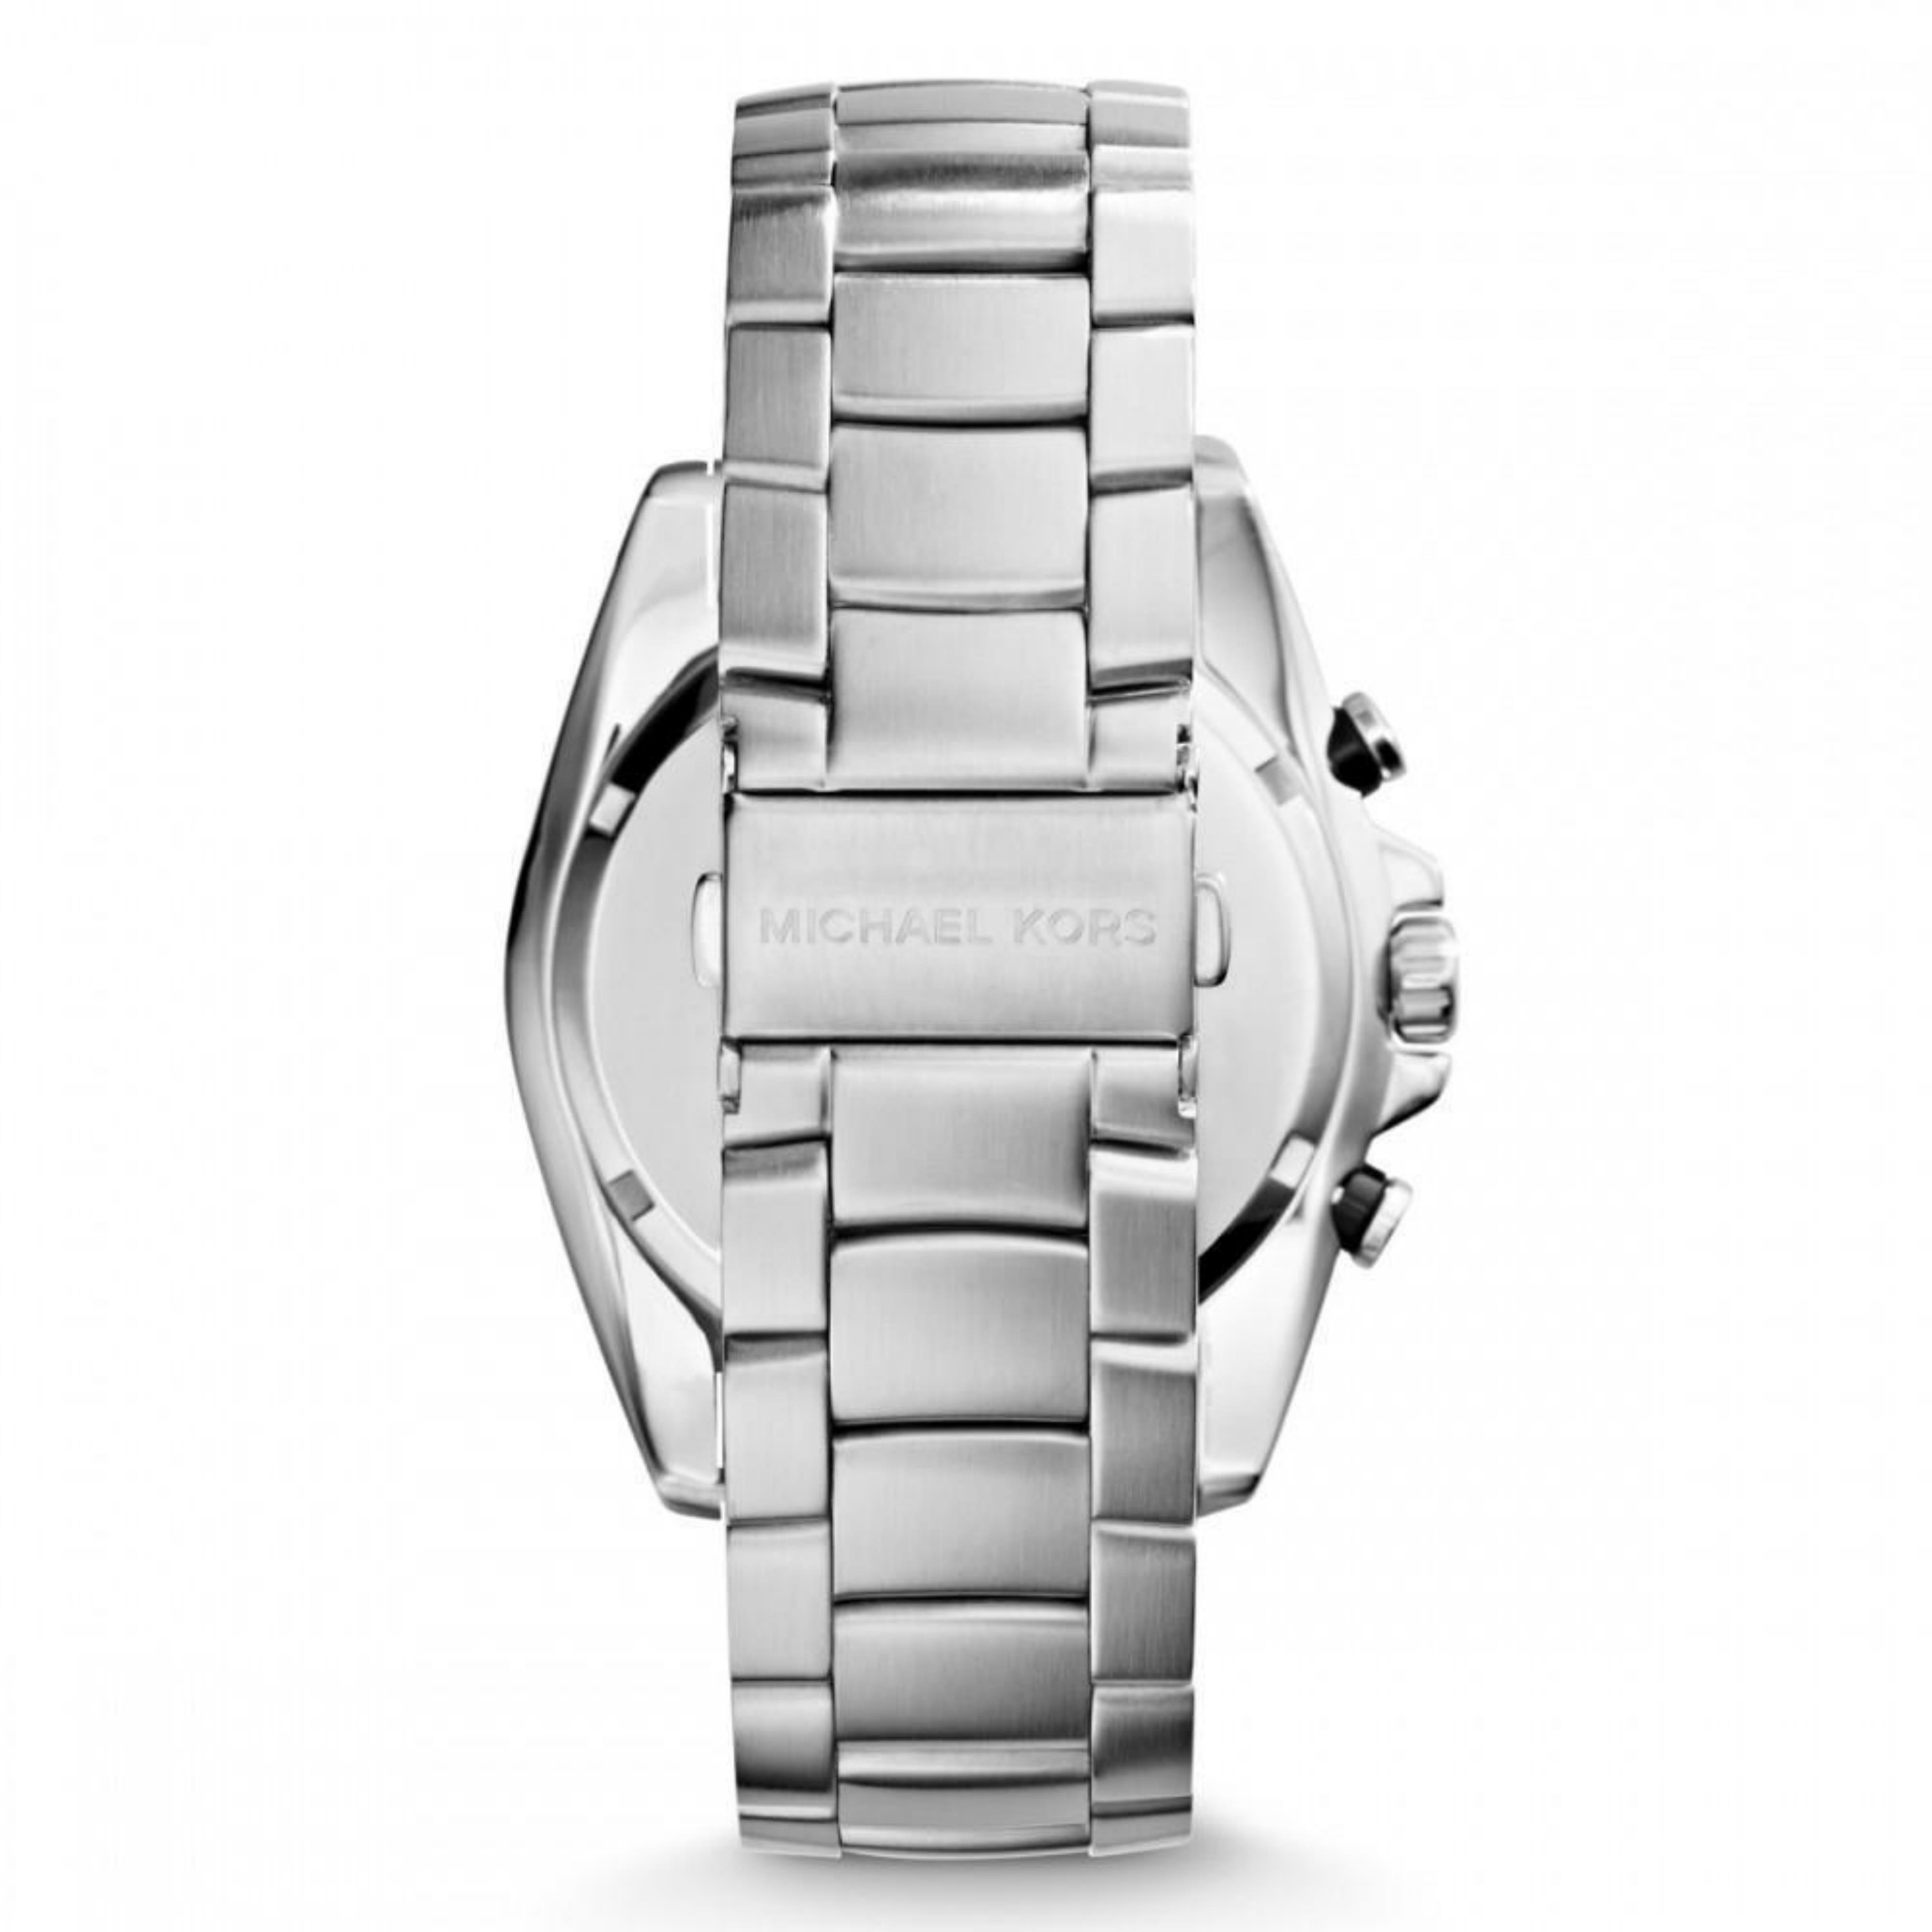 beade1cd636f Michael Kors Bradshaw Logo Dial Chronograph Designer Silver Men s Watch  MK8339 Thumbnail 4